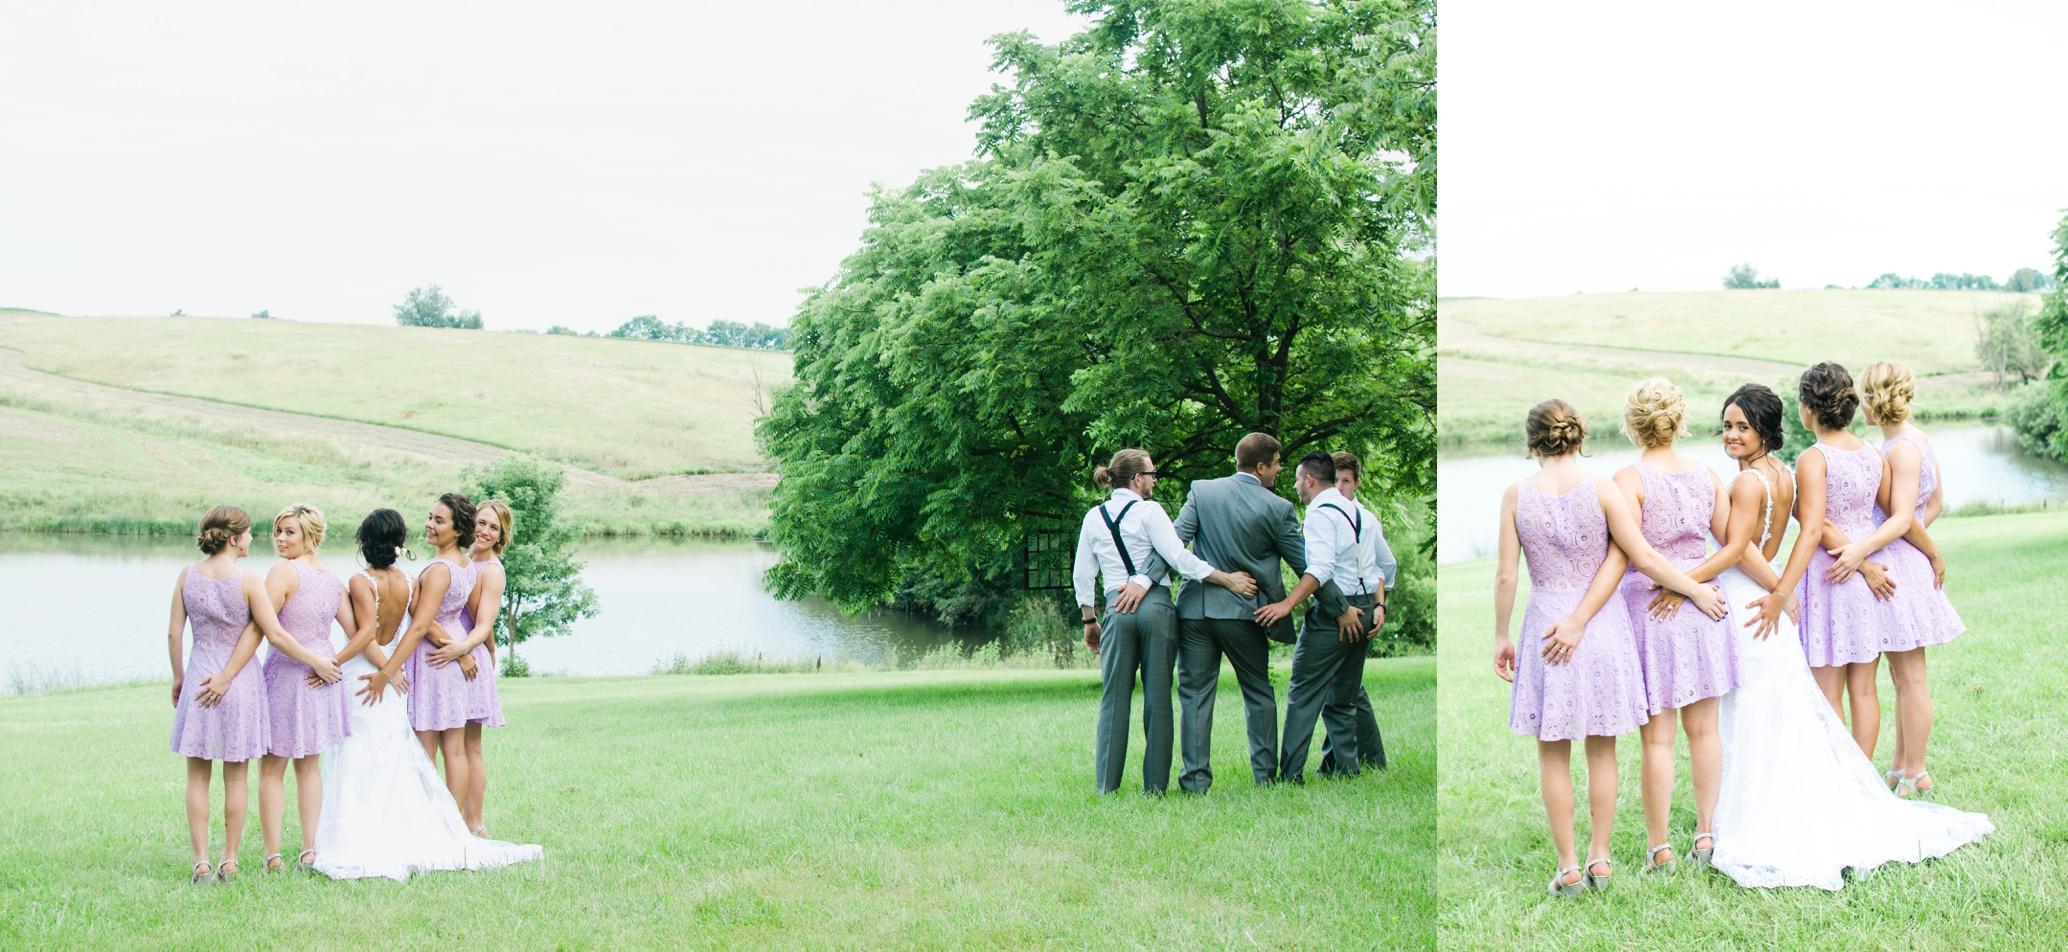 Barnes' Place Rustic Outdoor Wedding | Ali Leigh Photo Minneapolis Wedding Photographer_0196.jpg